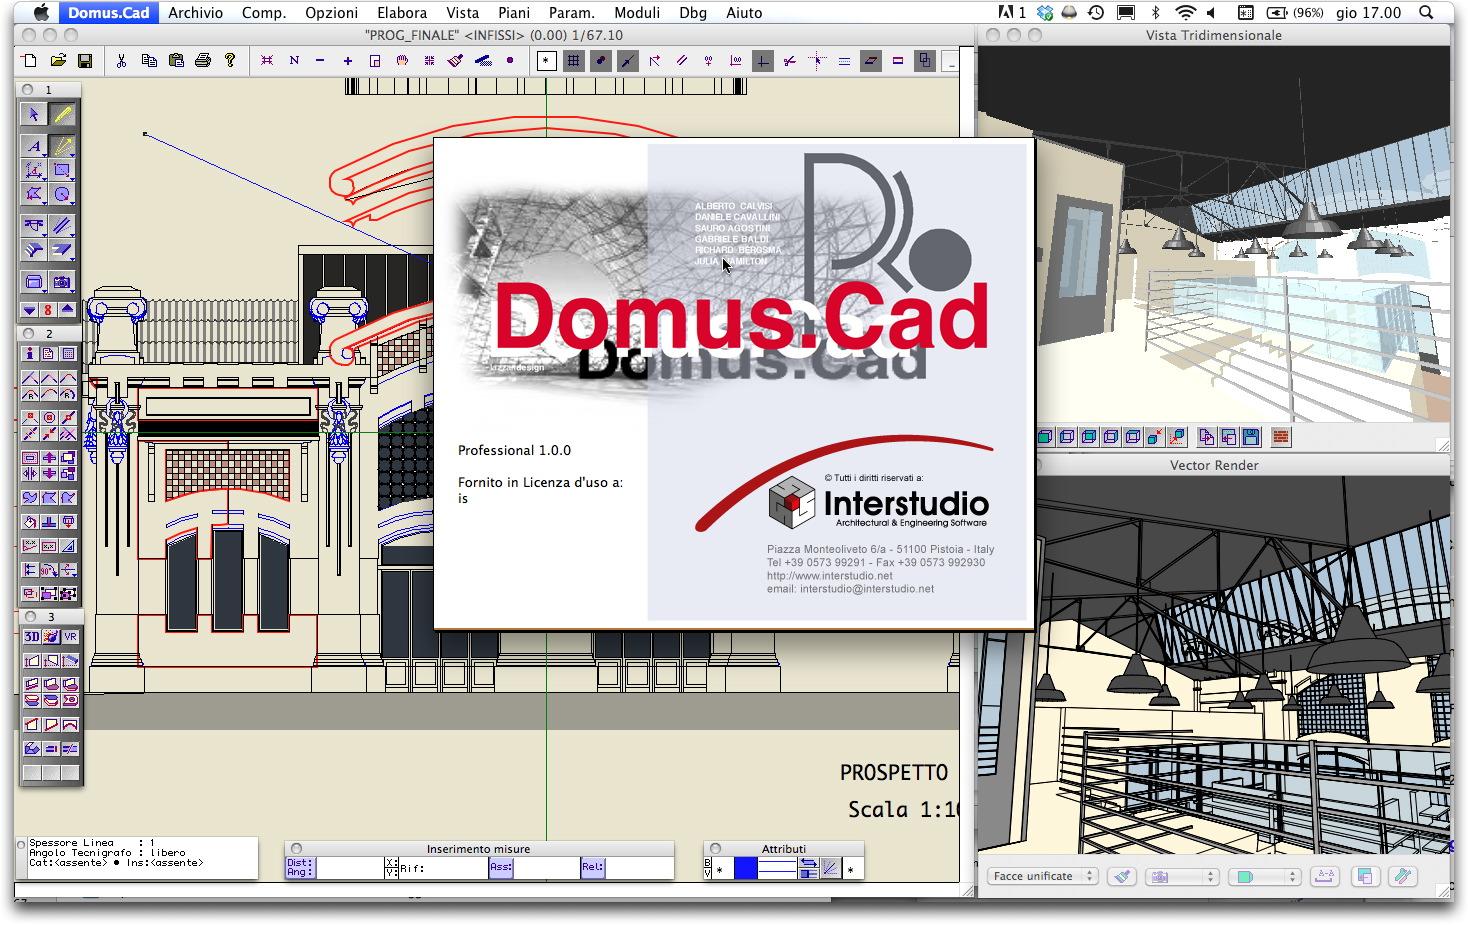 Domus cad pro3 bim portale for Progettazione 3d gratis